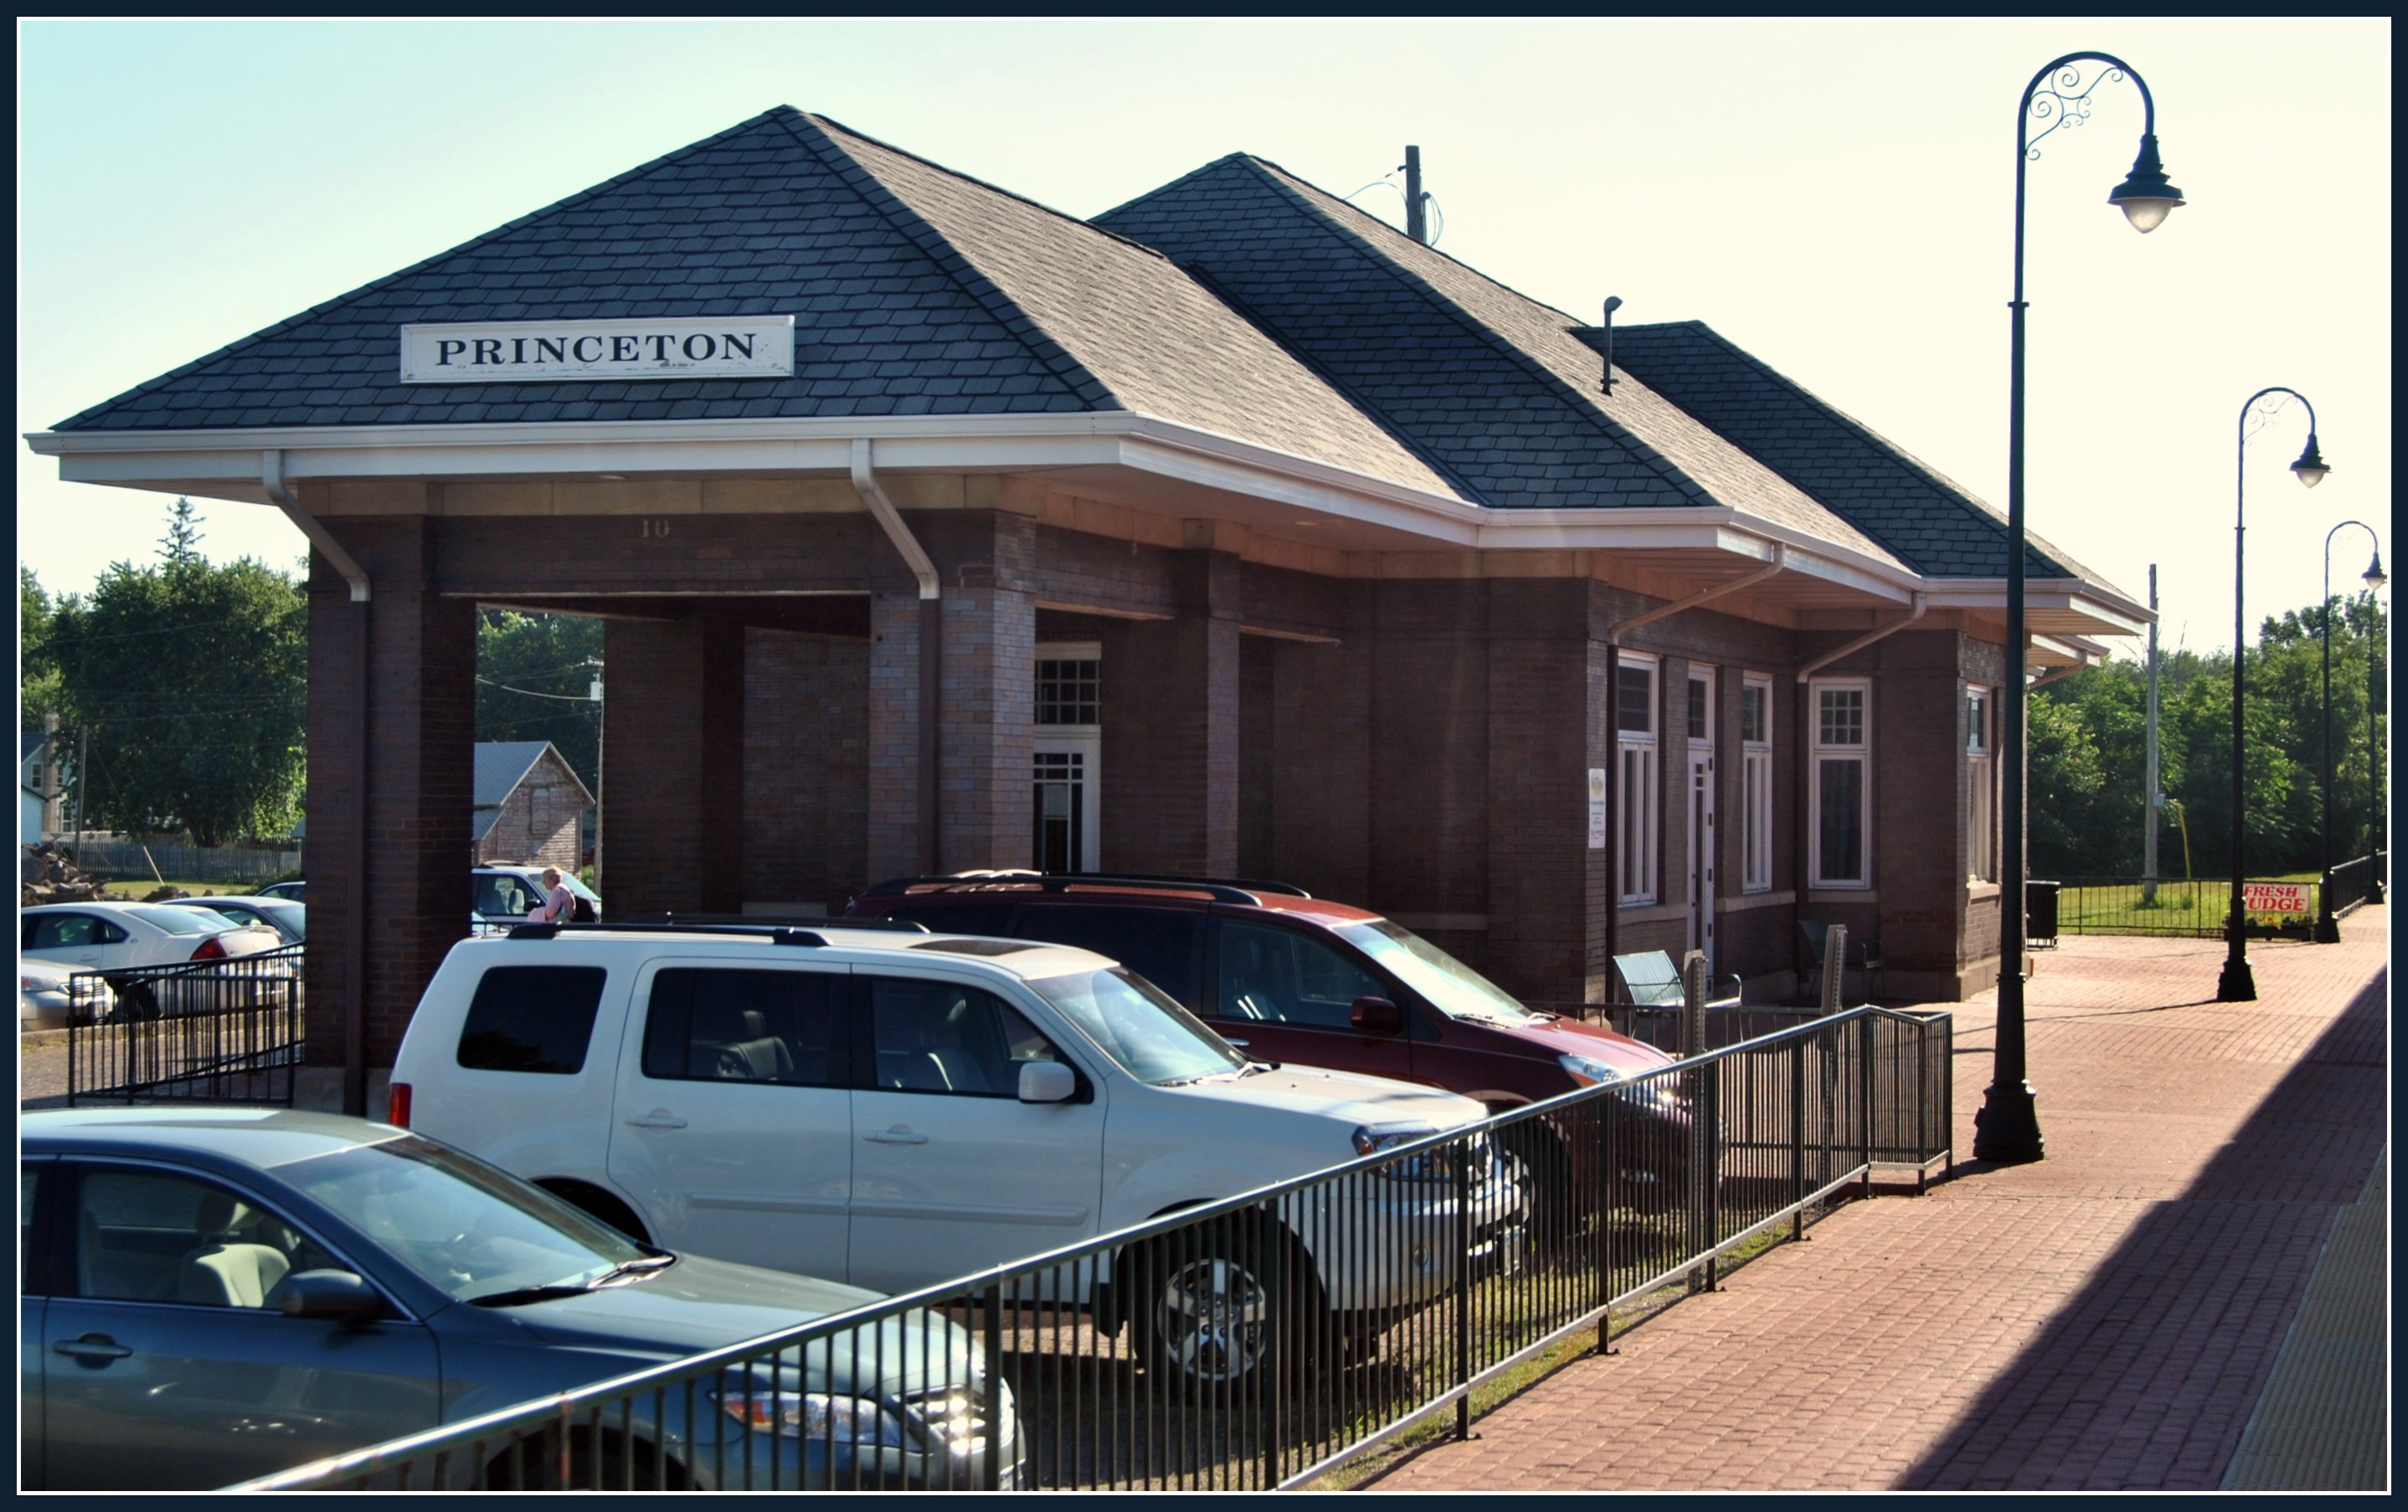 Illinois bureau county princeton - Travel Station Illinois July Amtrak Princeton Californiazephyr 2011